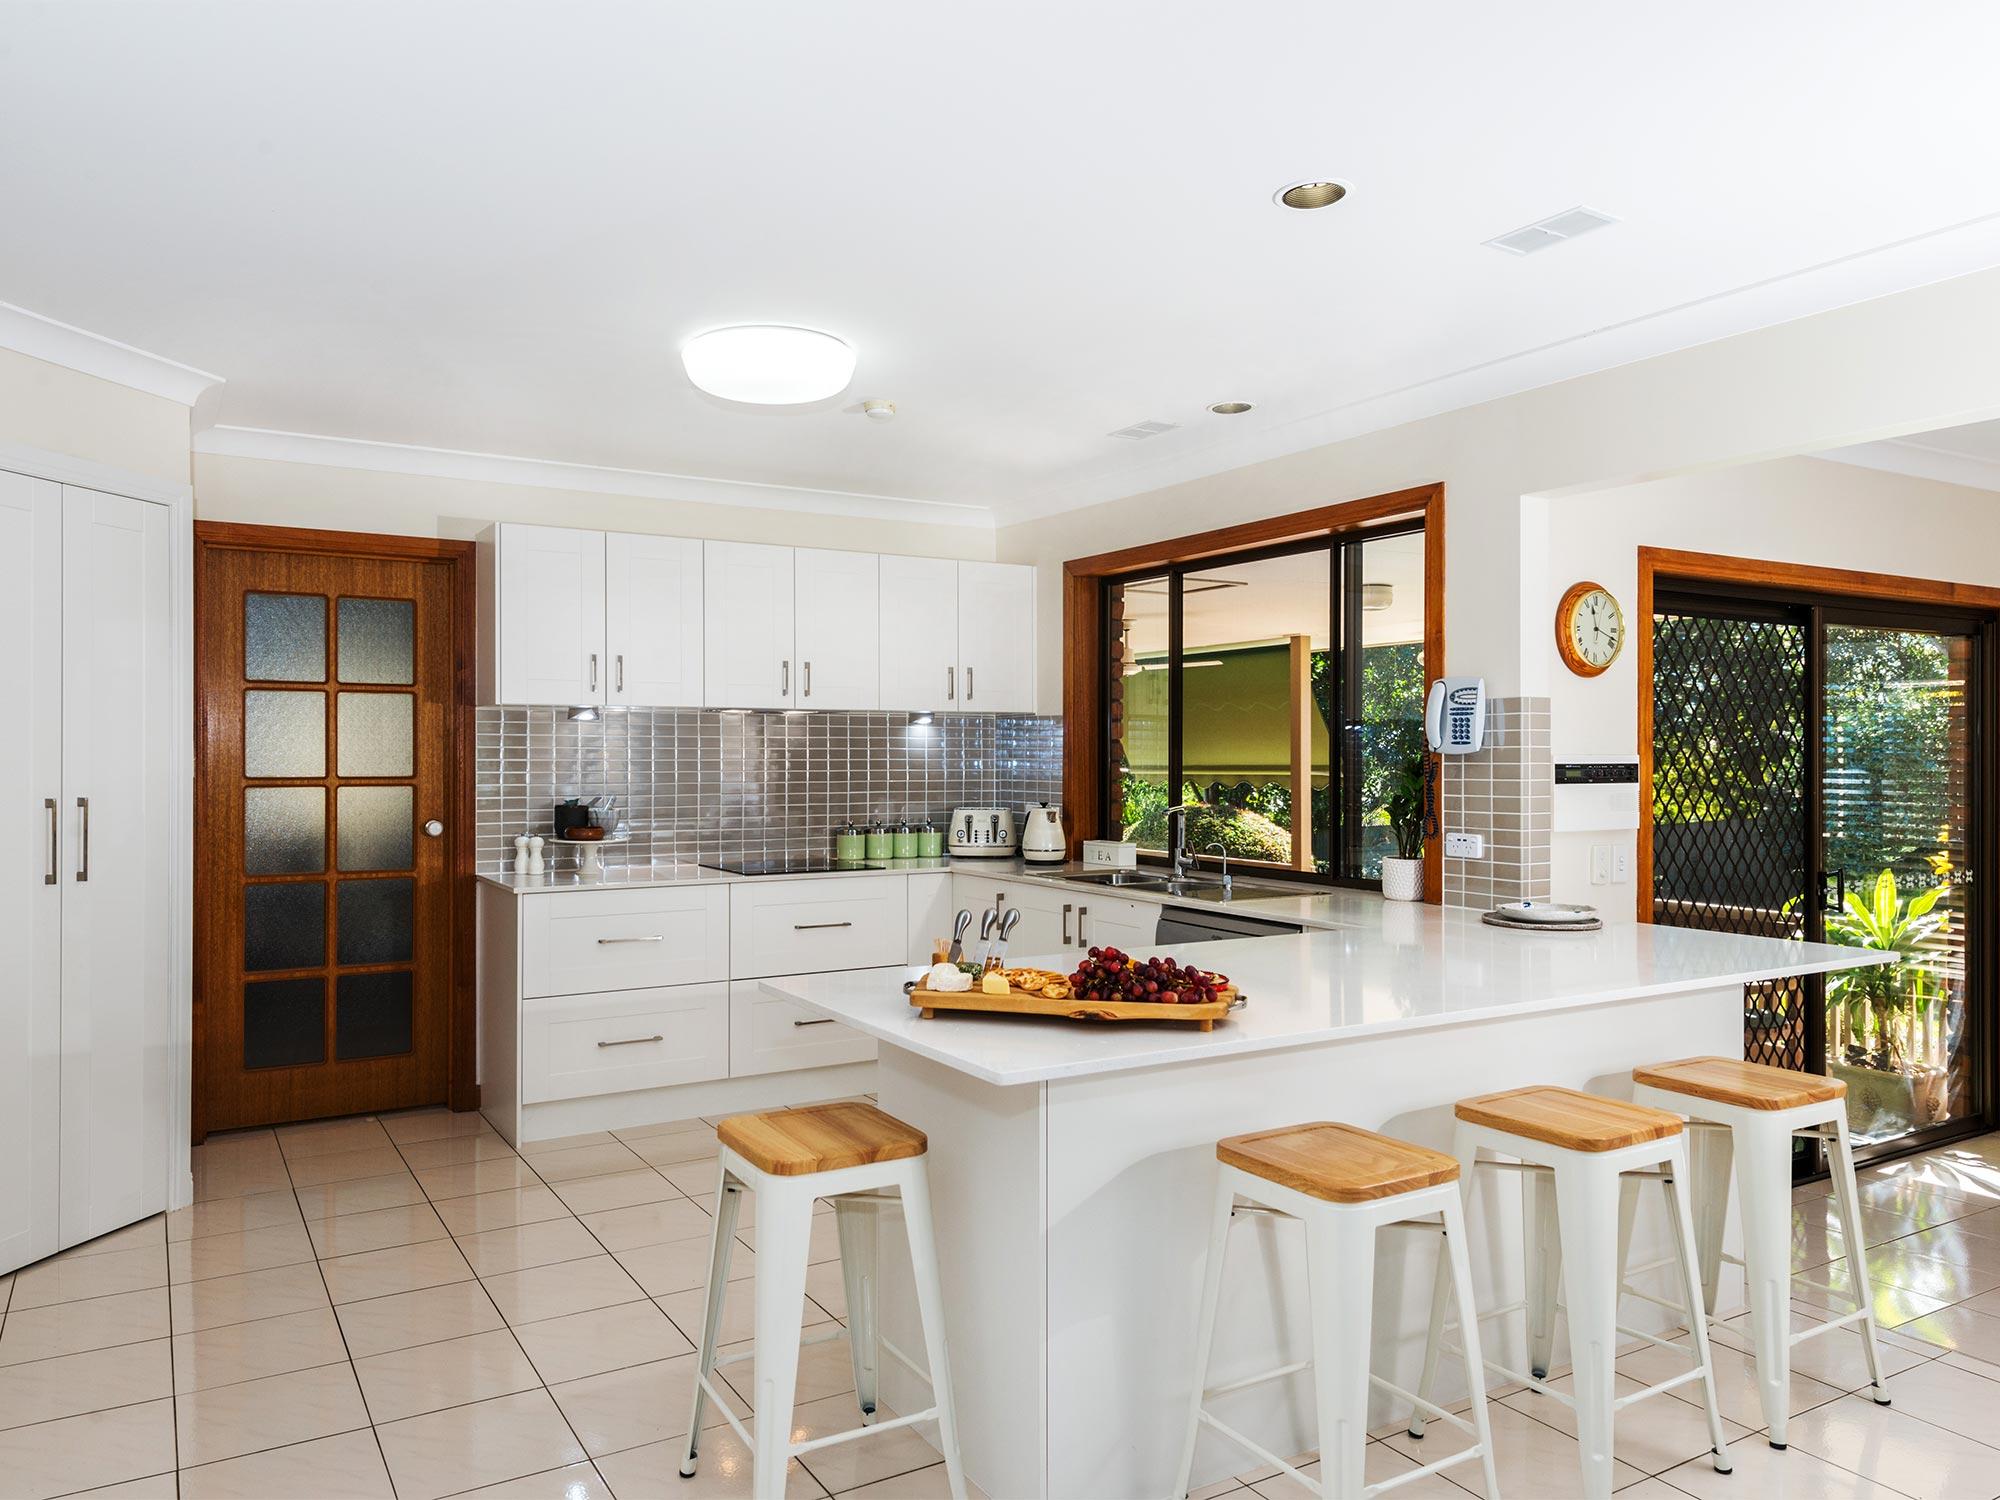 U Shaped Kitchen Designs & Ideas  realestate.com.au